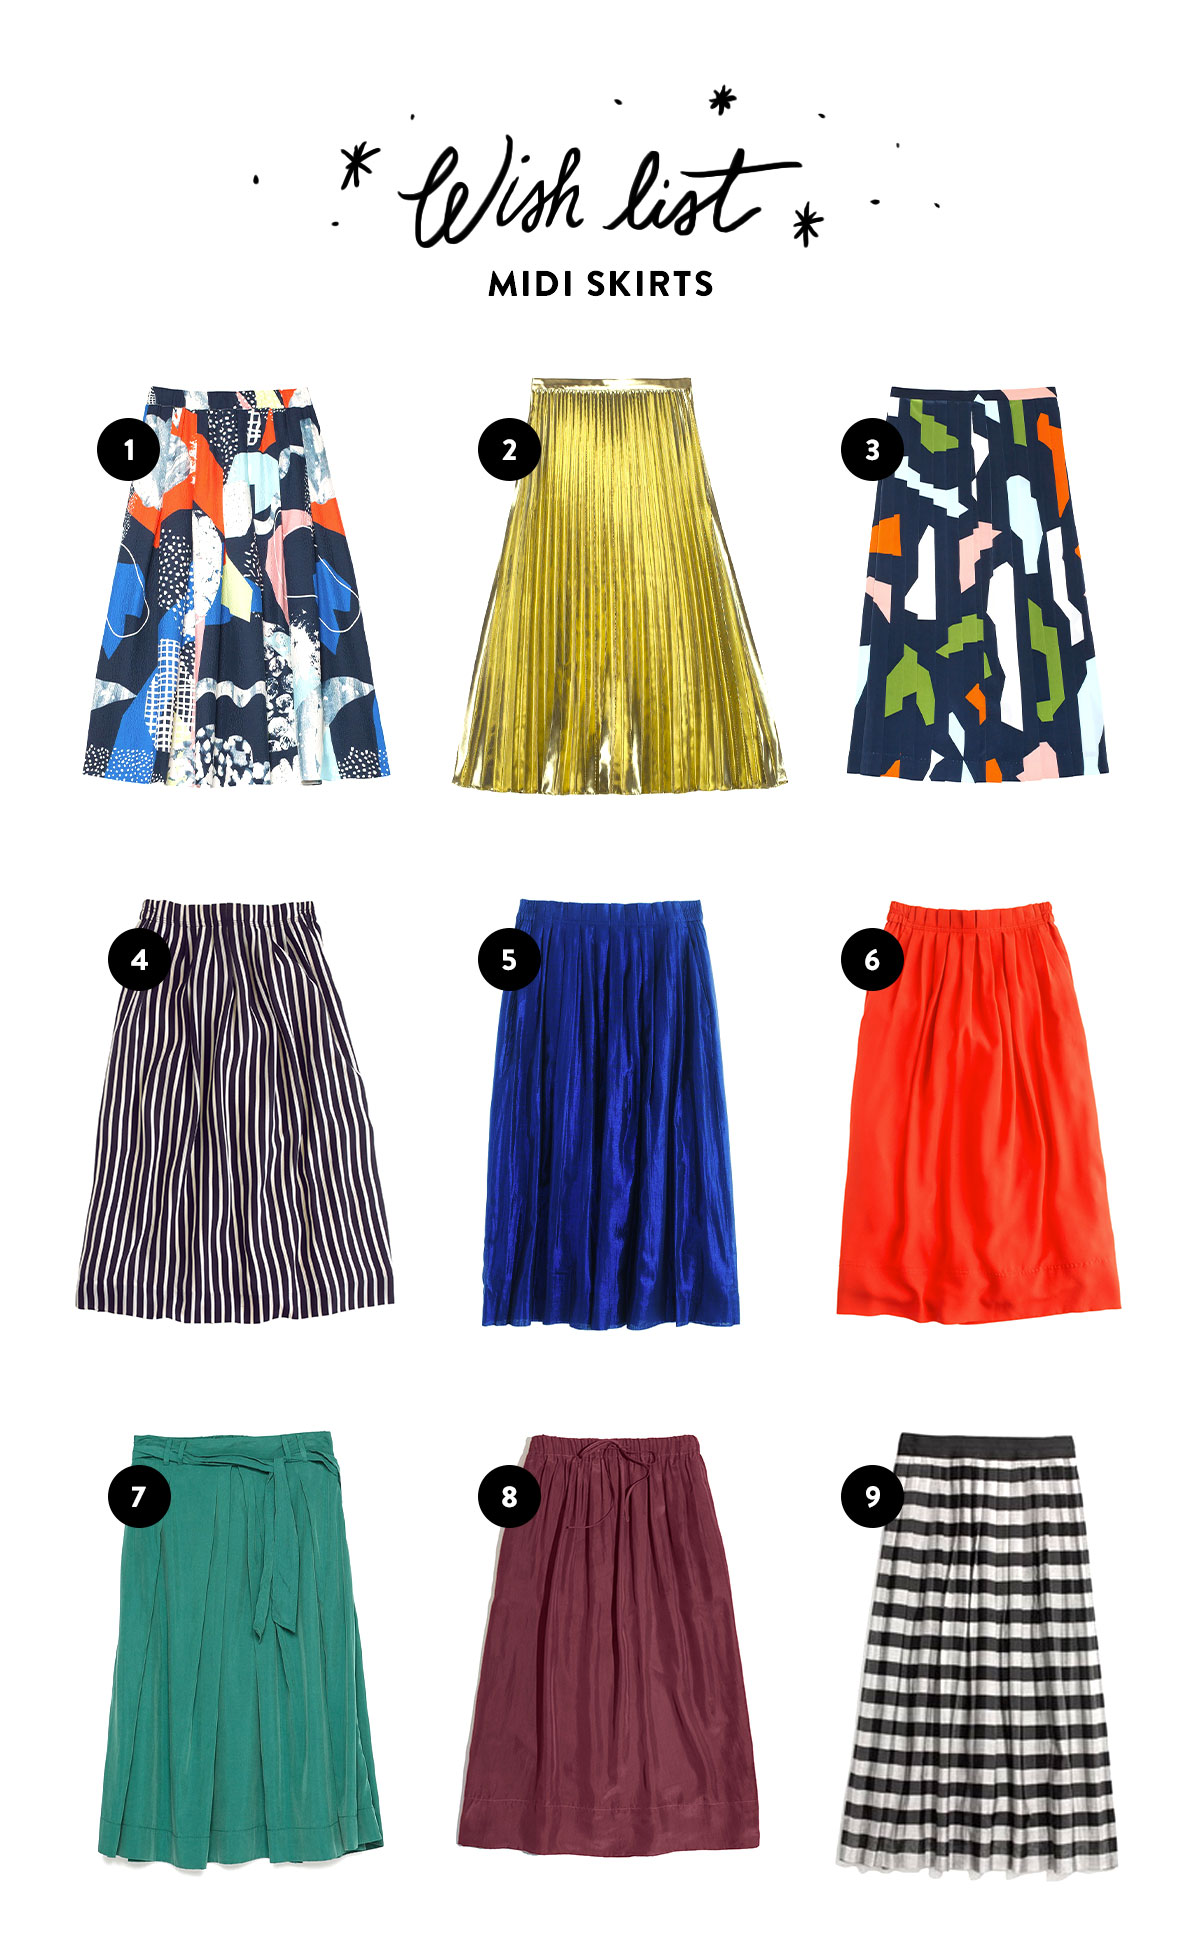 Wish List: Midi Skirts